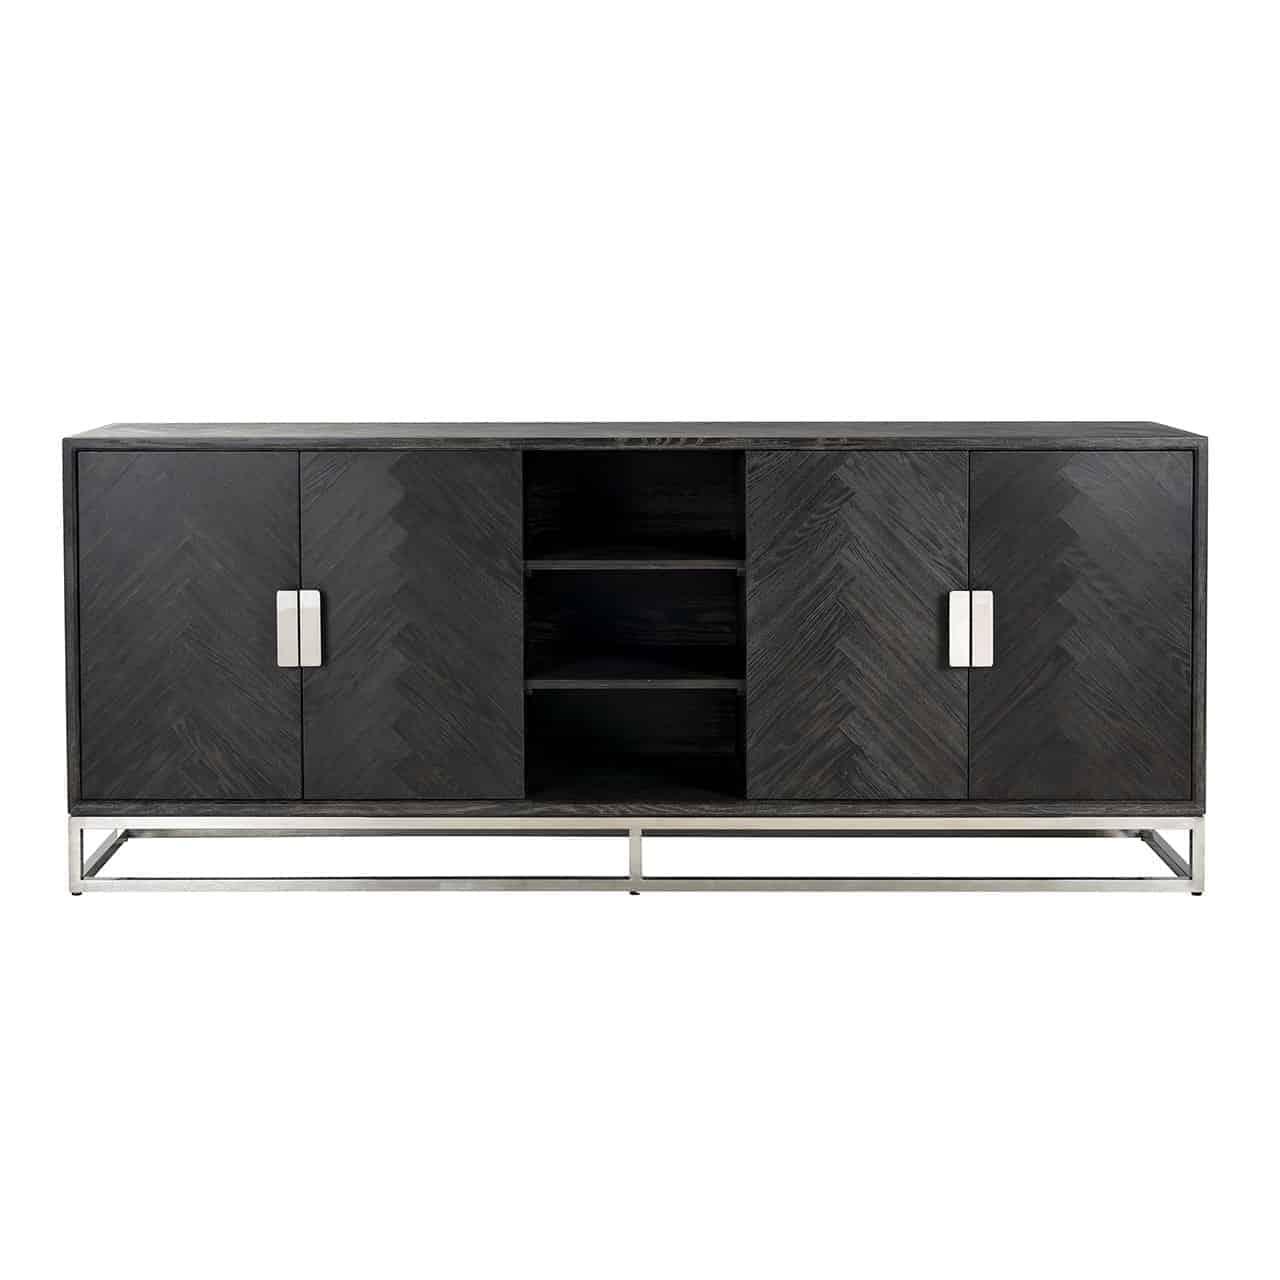 Dressoir Blackbone silver 4-deuren + open vak (Black)